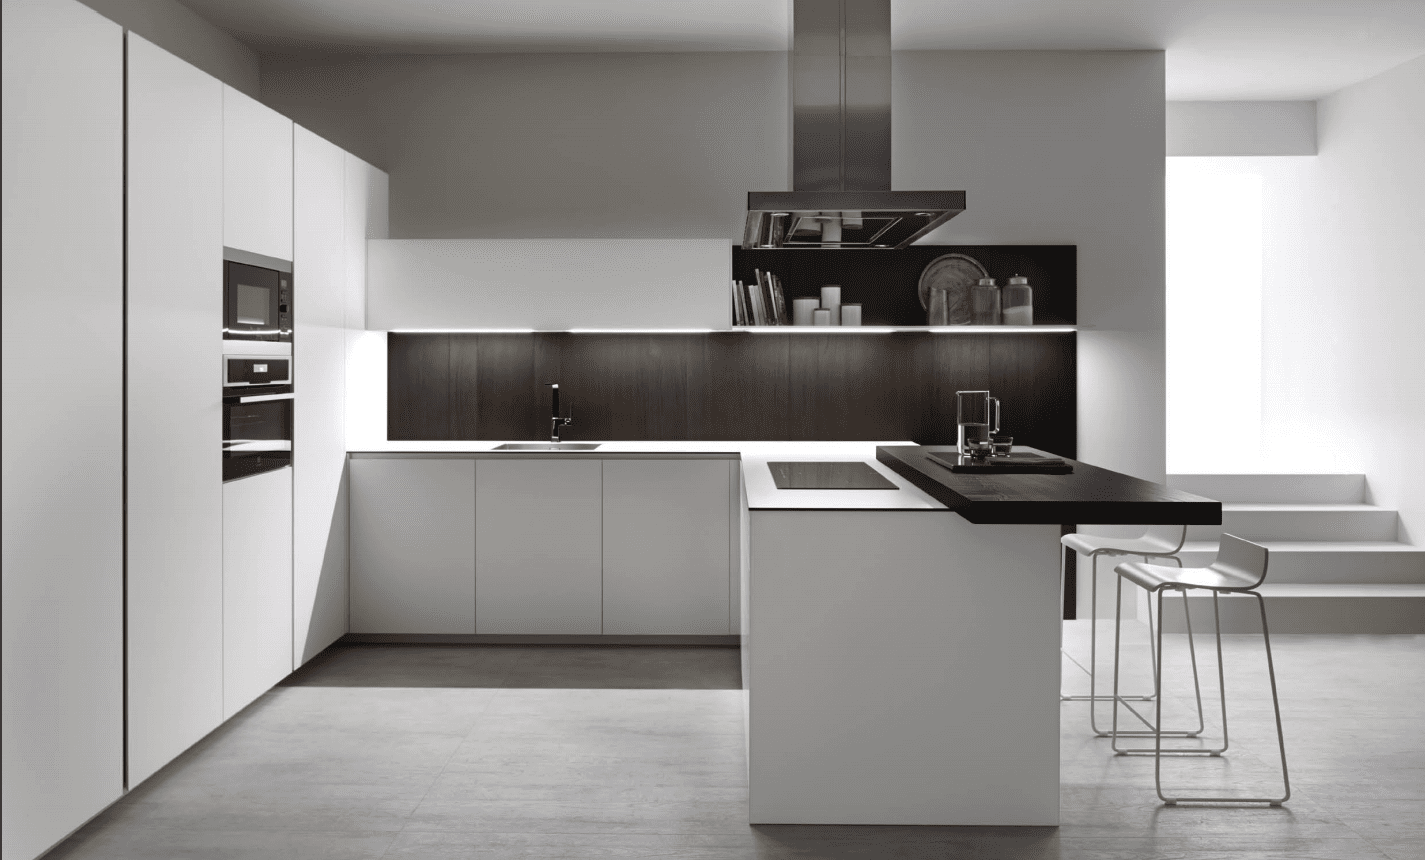 Cocinova Pon un toque de modernidad en tu cocina- Cocinova